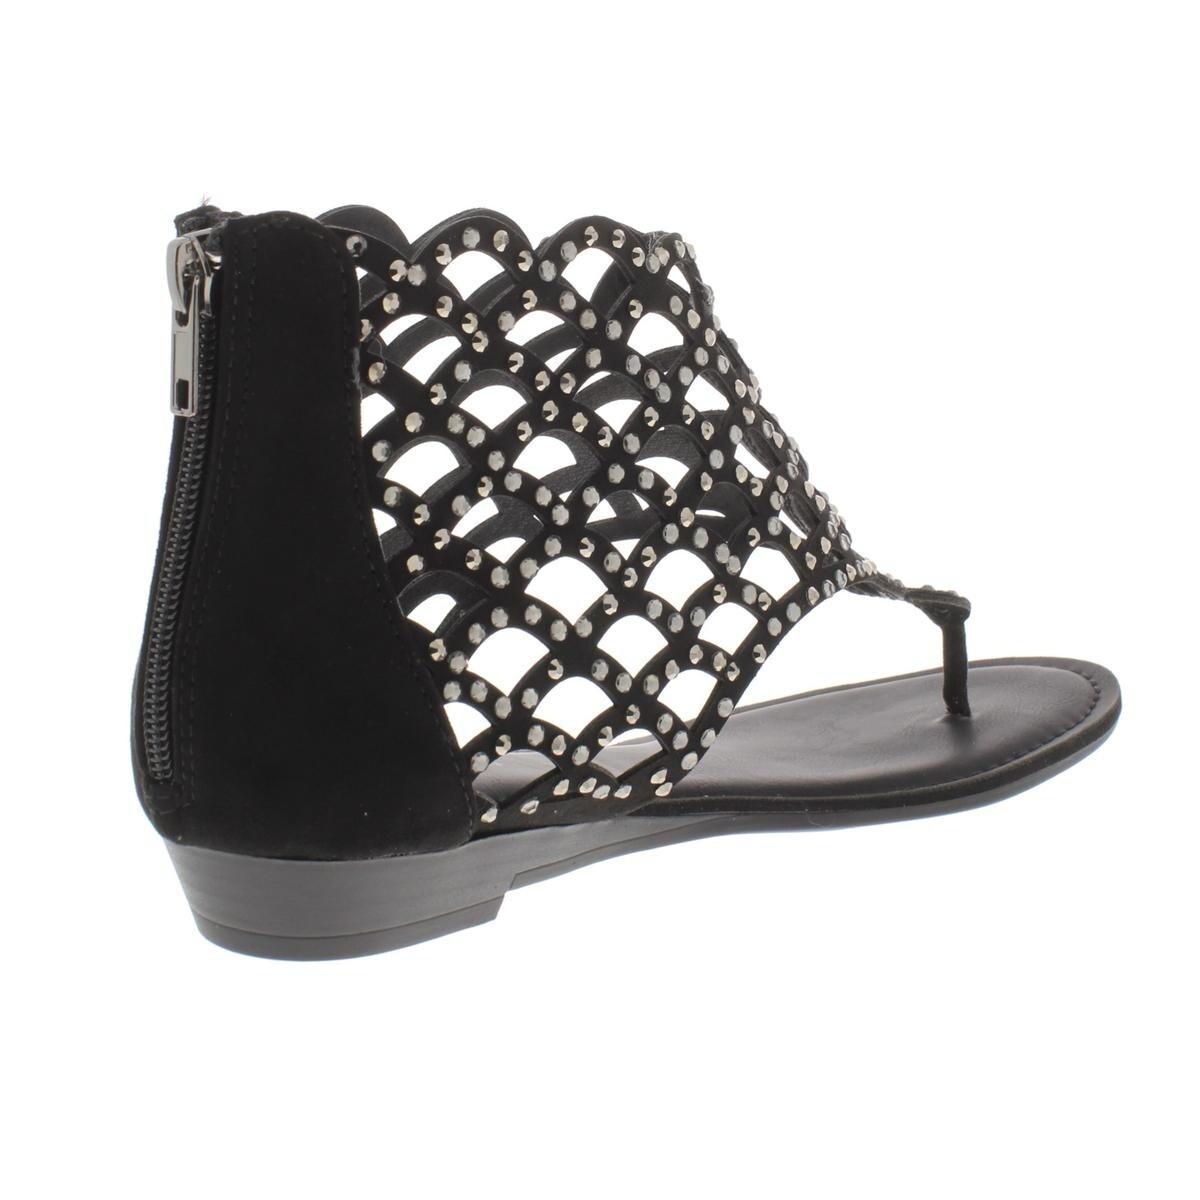 d645b6c3c13cf9 Shop Zigi Soho Womens Melaa Thong Sandals Rhinestone - Free Shipping On  Orders Over $45 - Overstock - 27592825